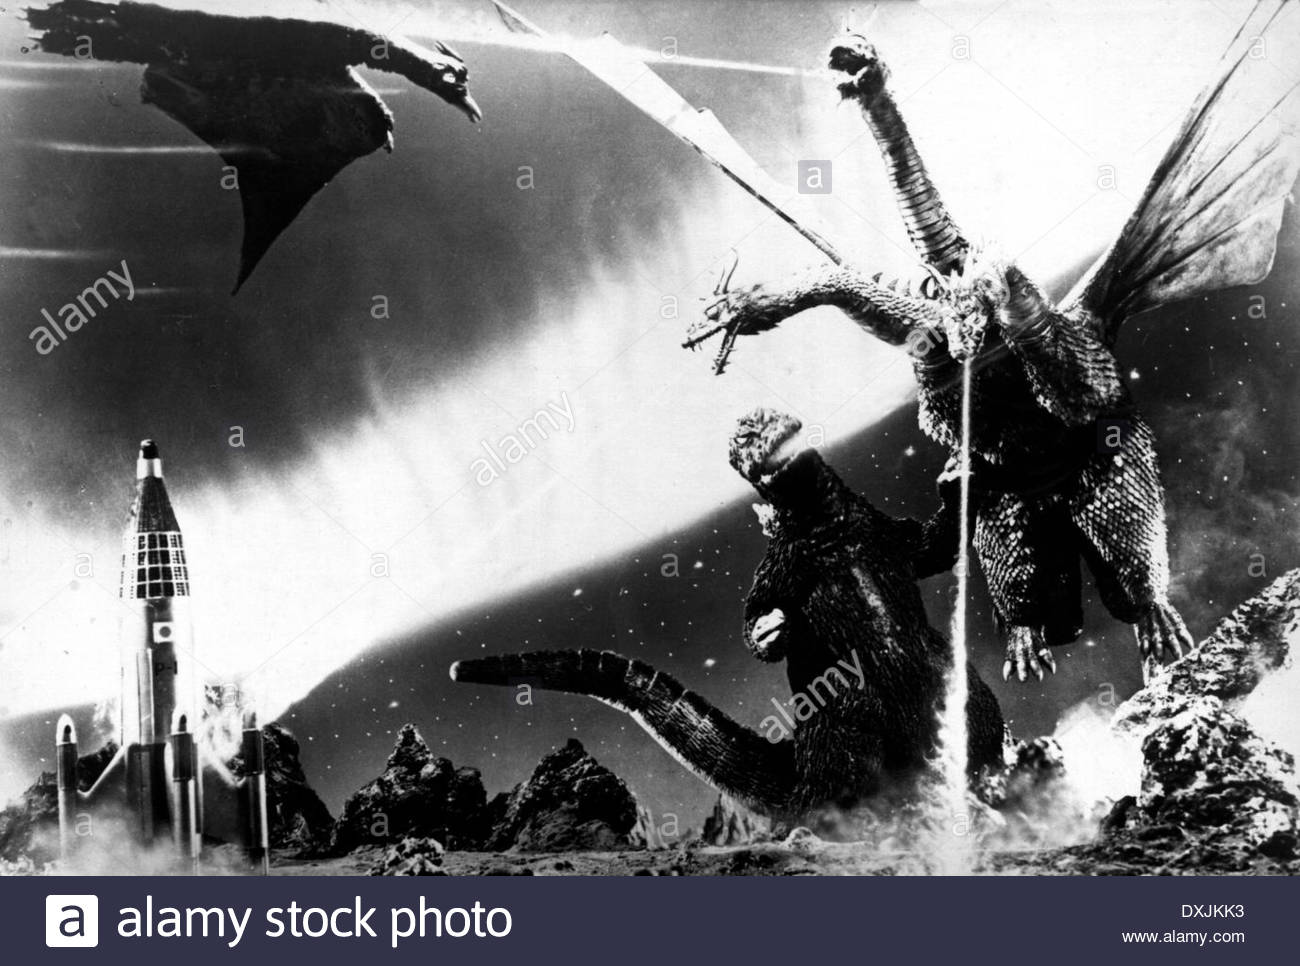 Invasion Of Astro Monster 11